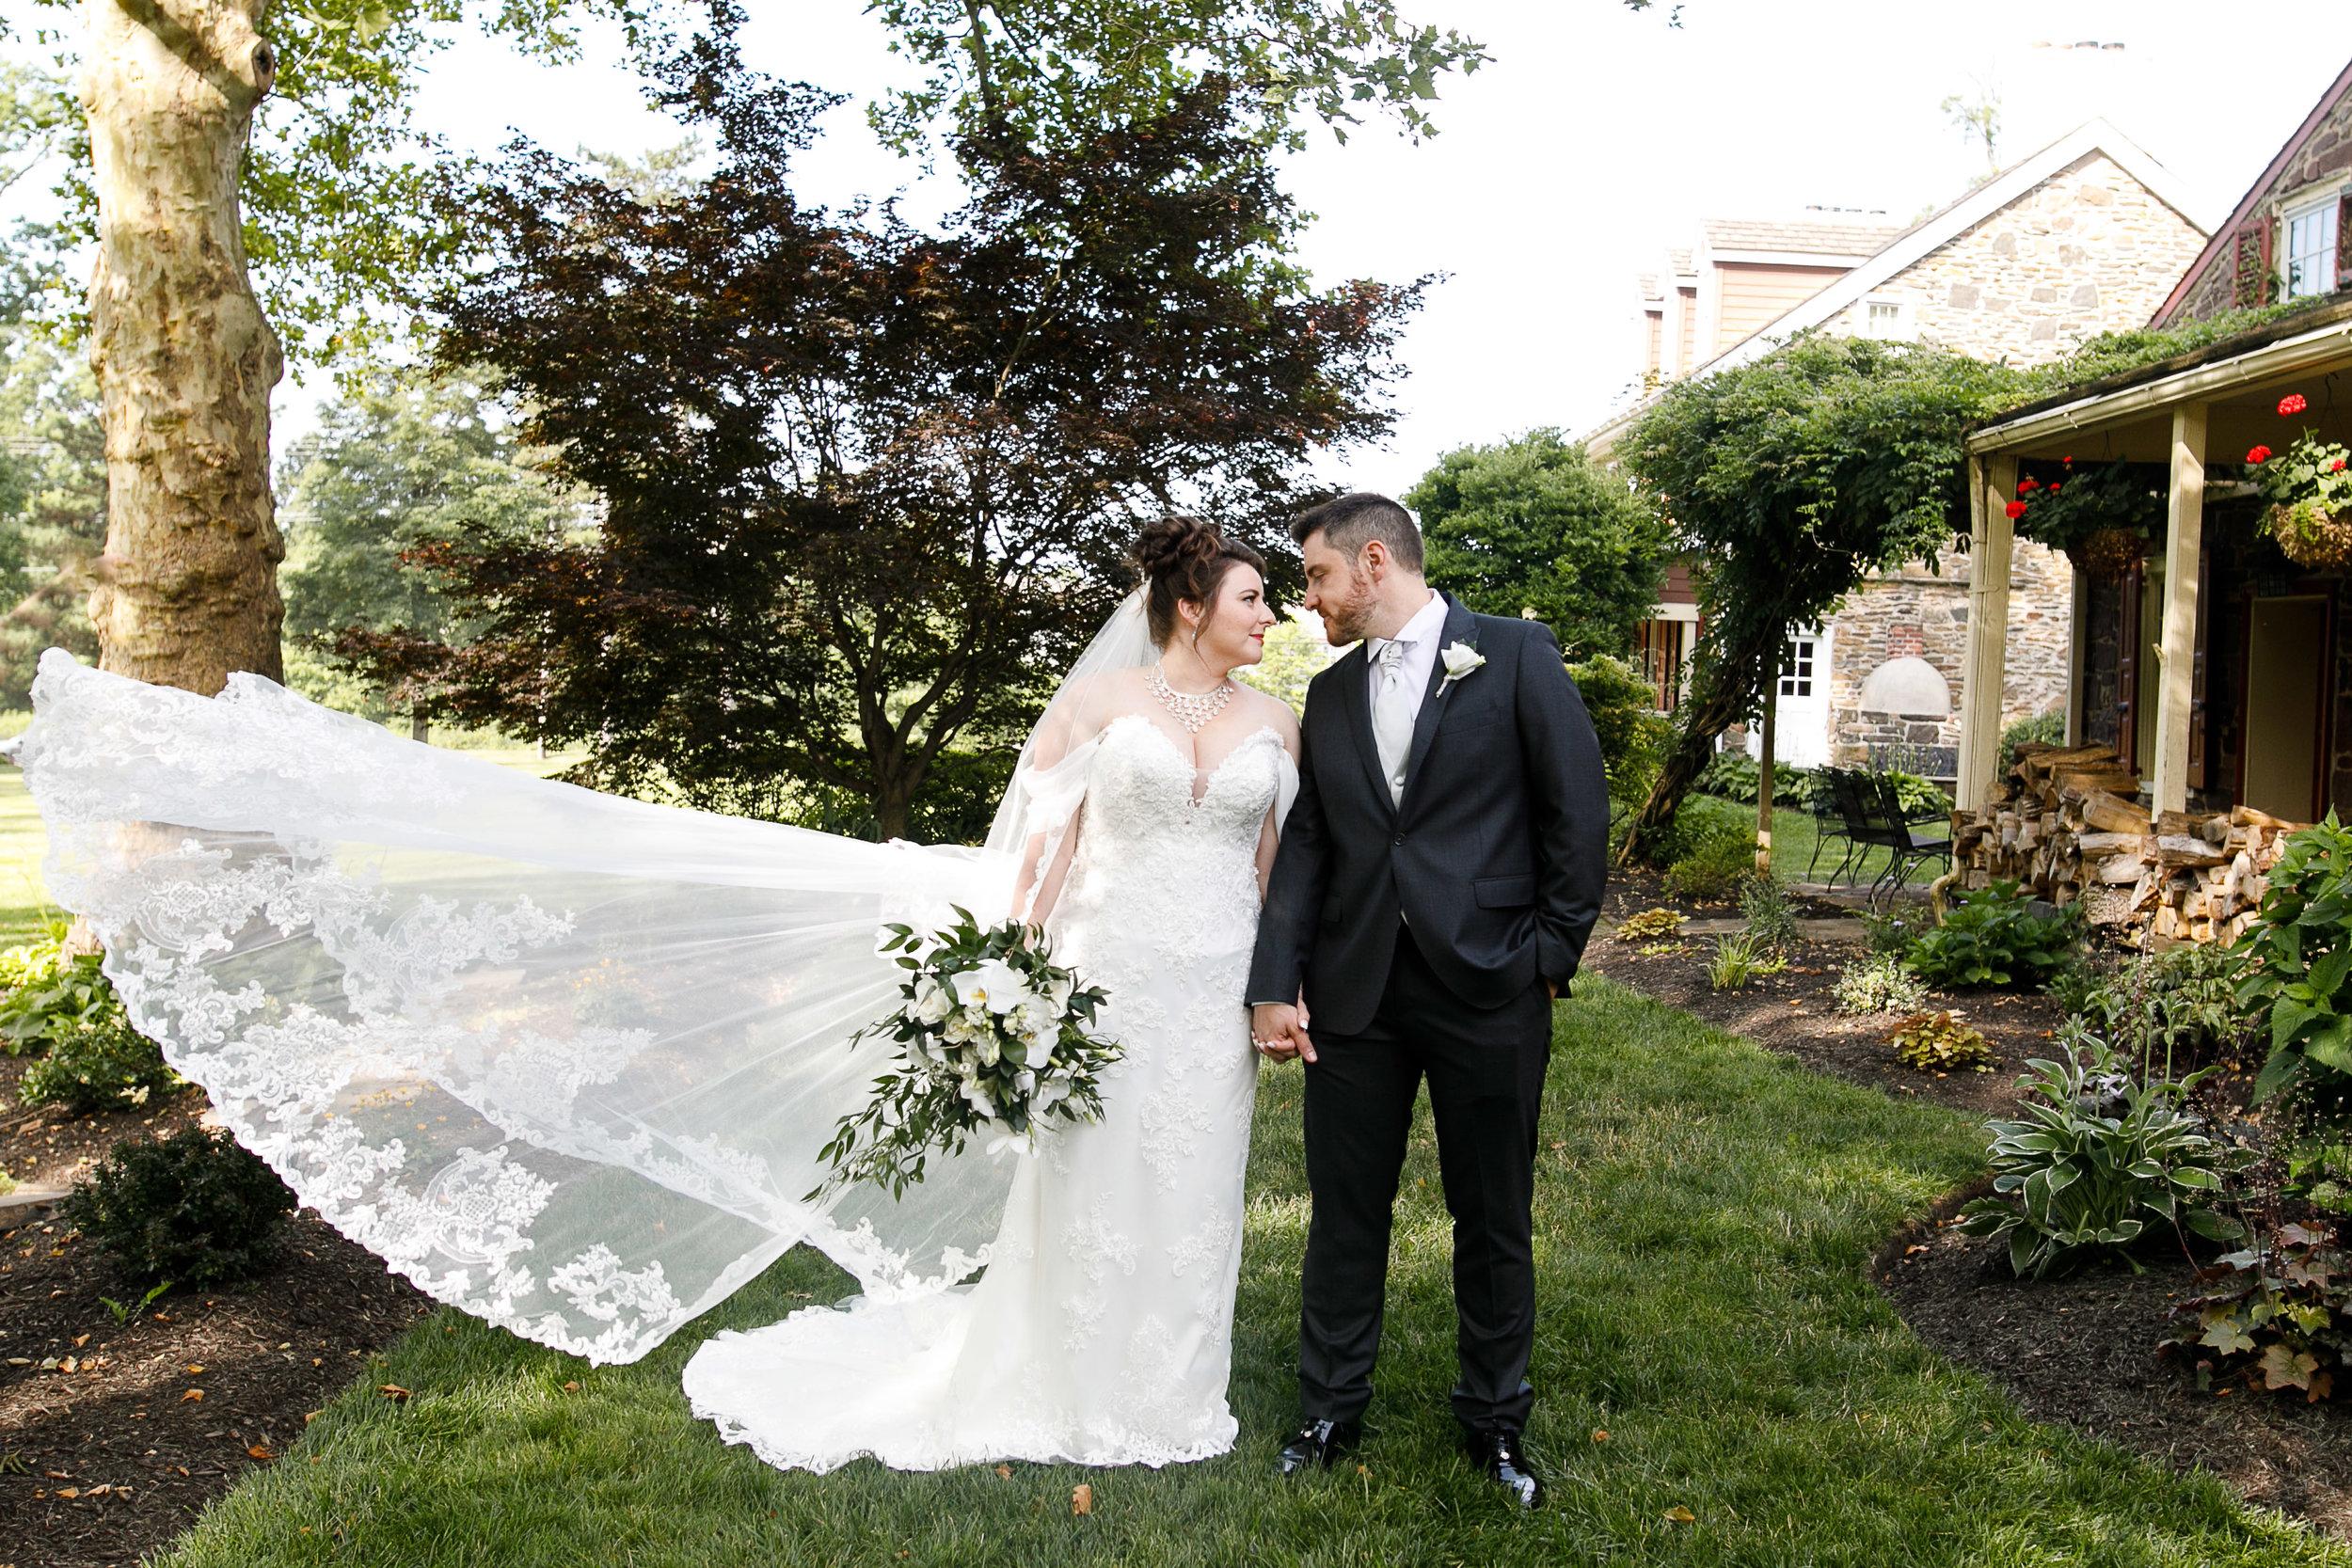 Wedding at Joseph Ambler In Bucks County PA12.jpg